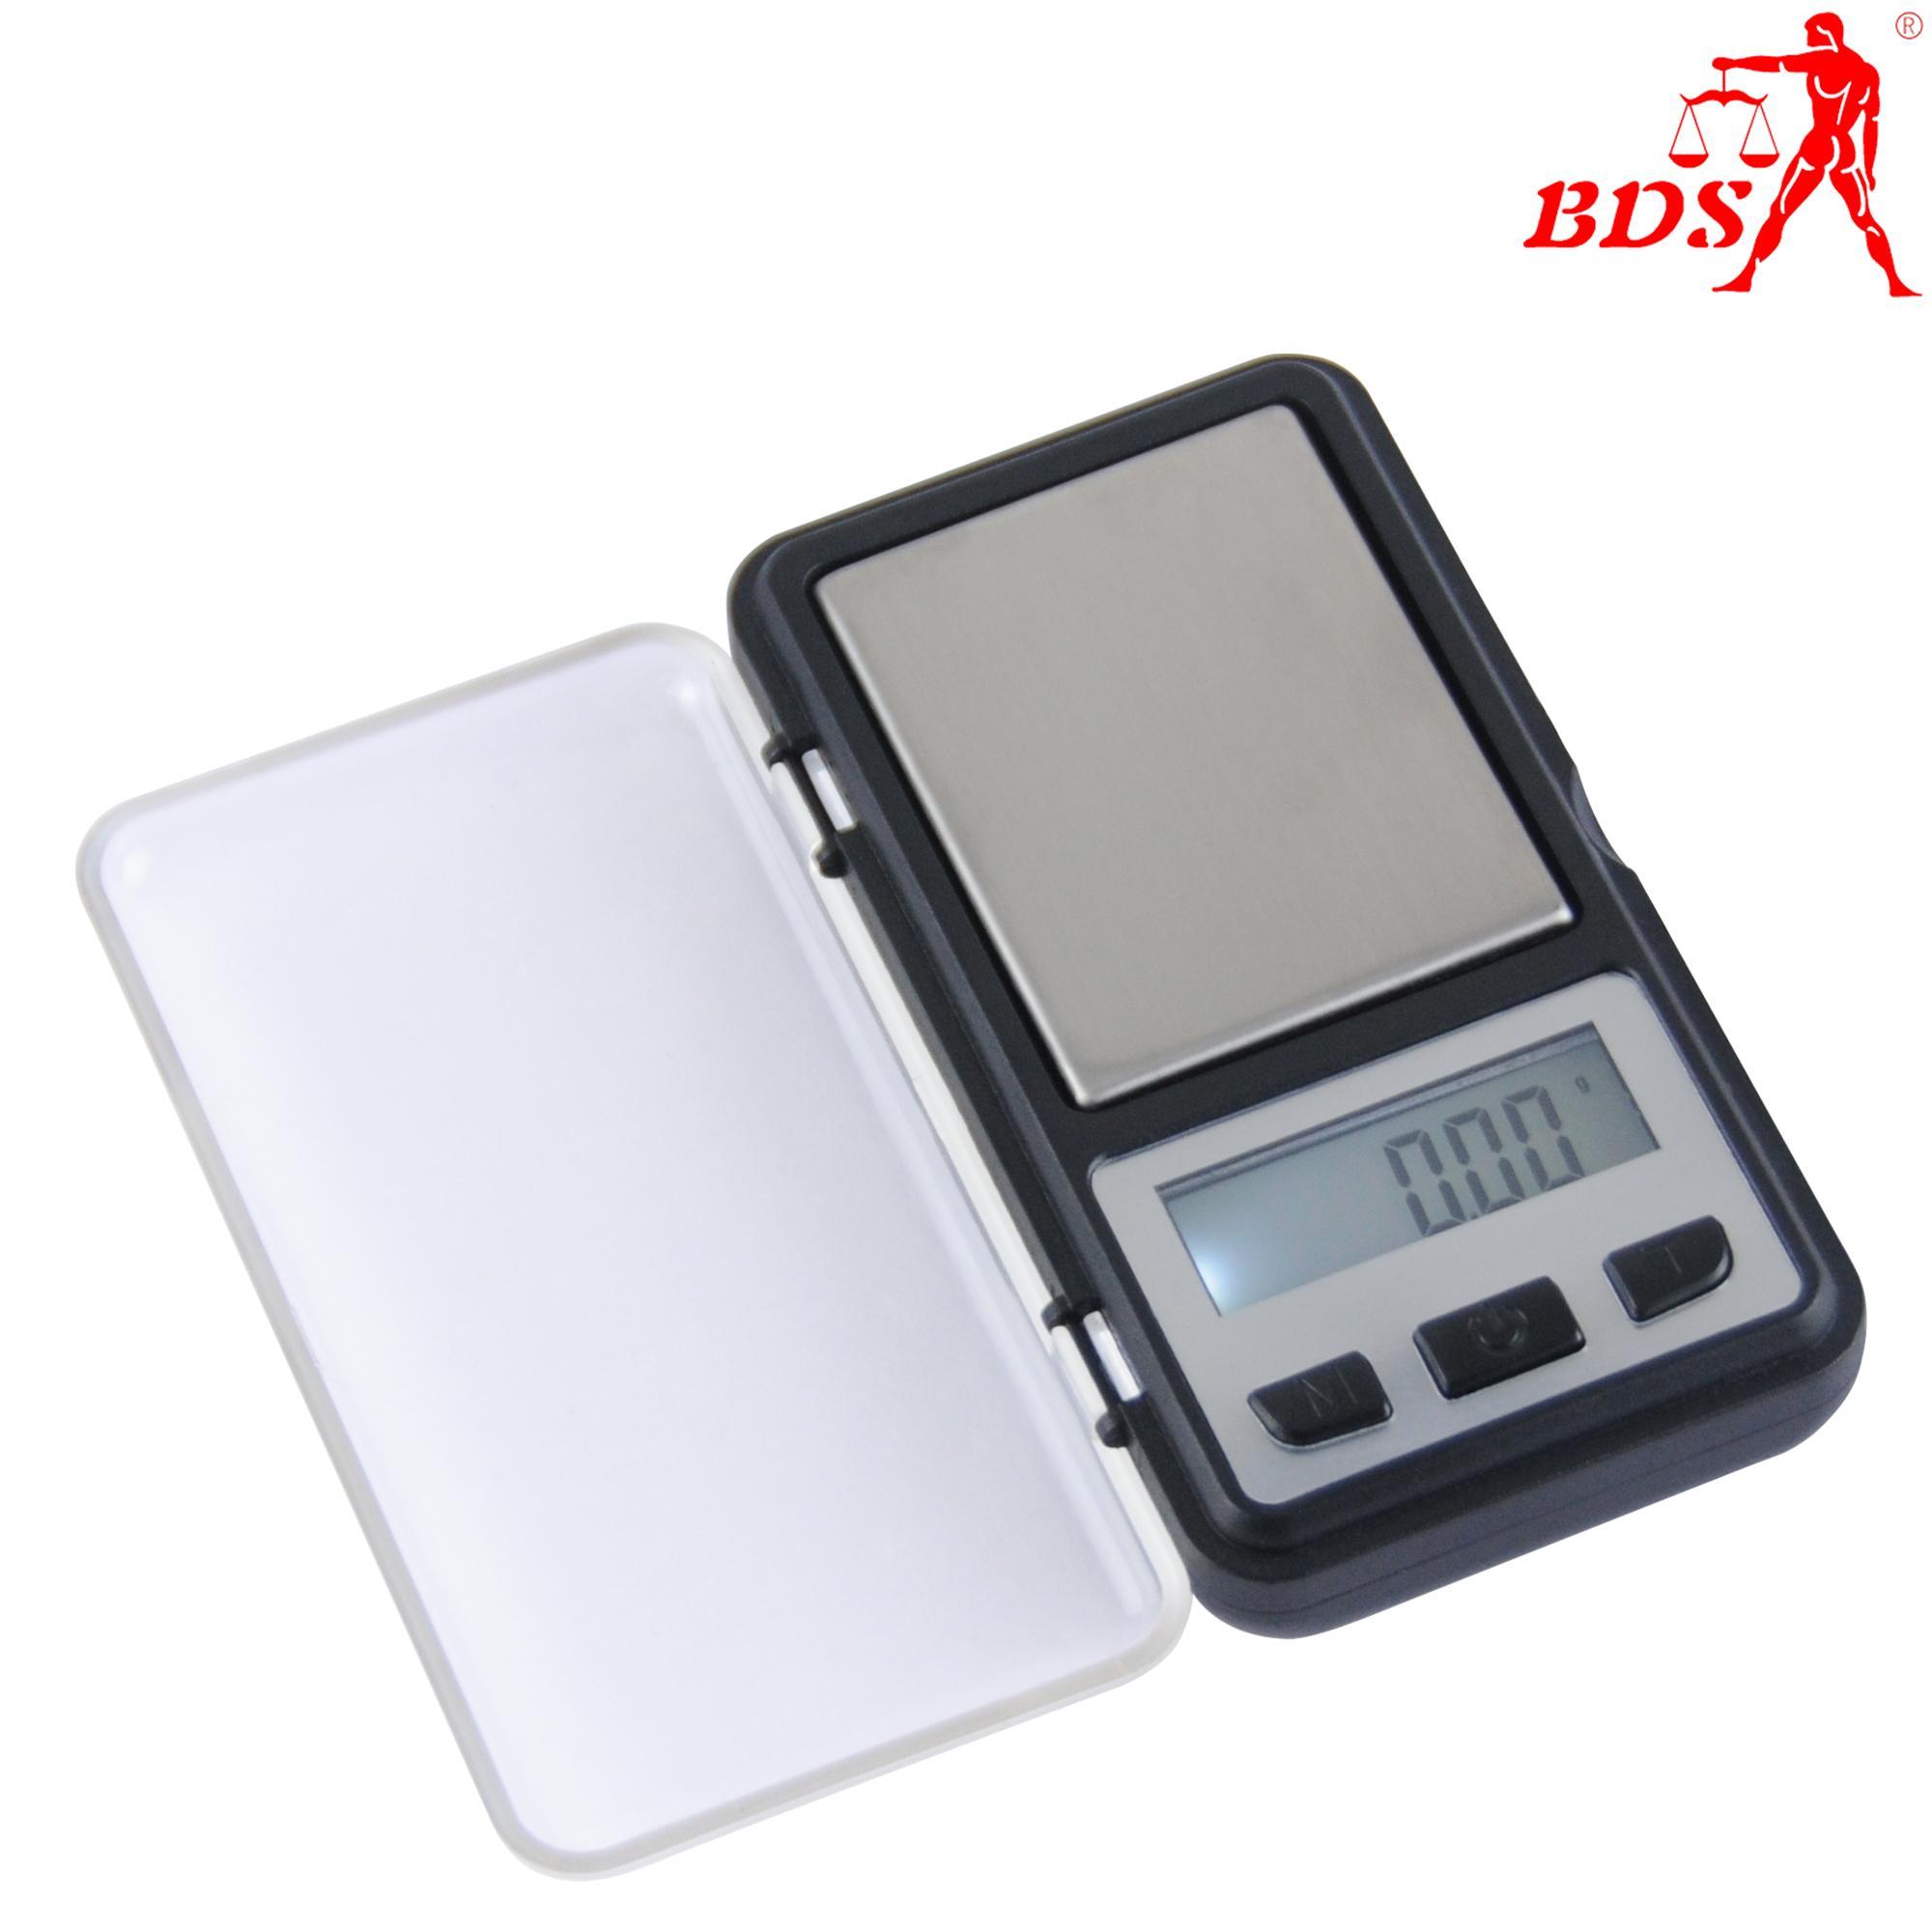 BDS6010便攜式電子口袋珠寶秤 3